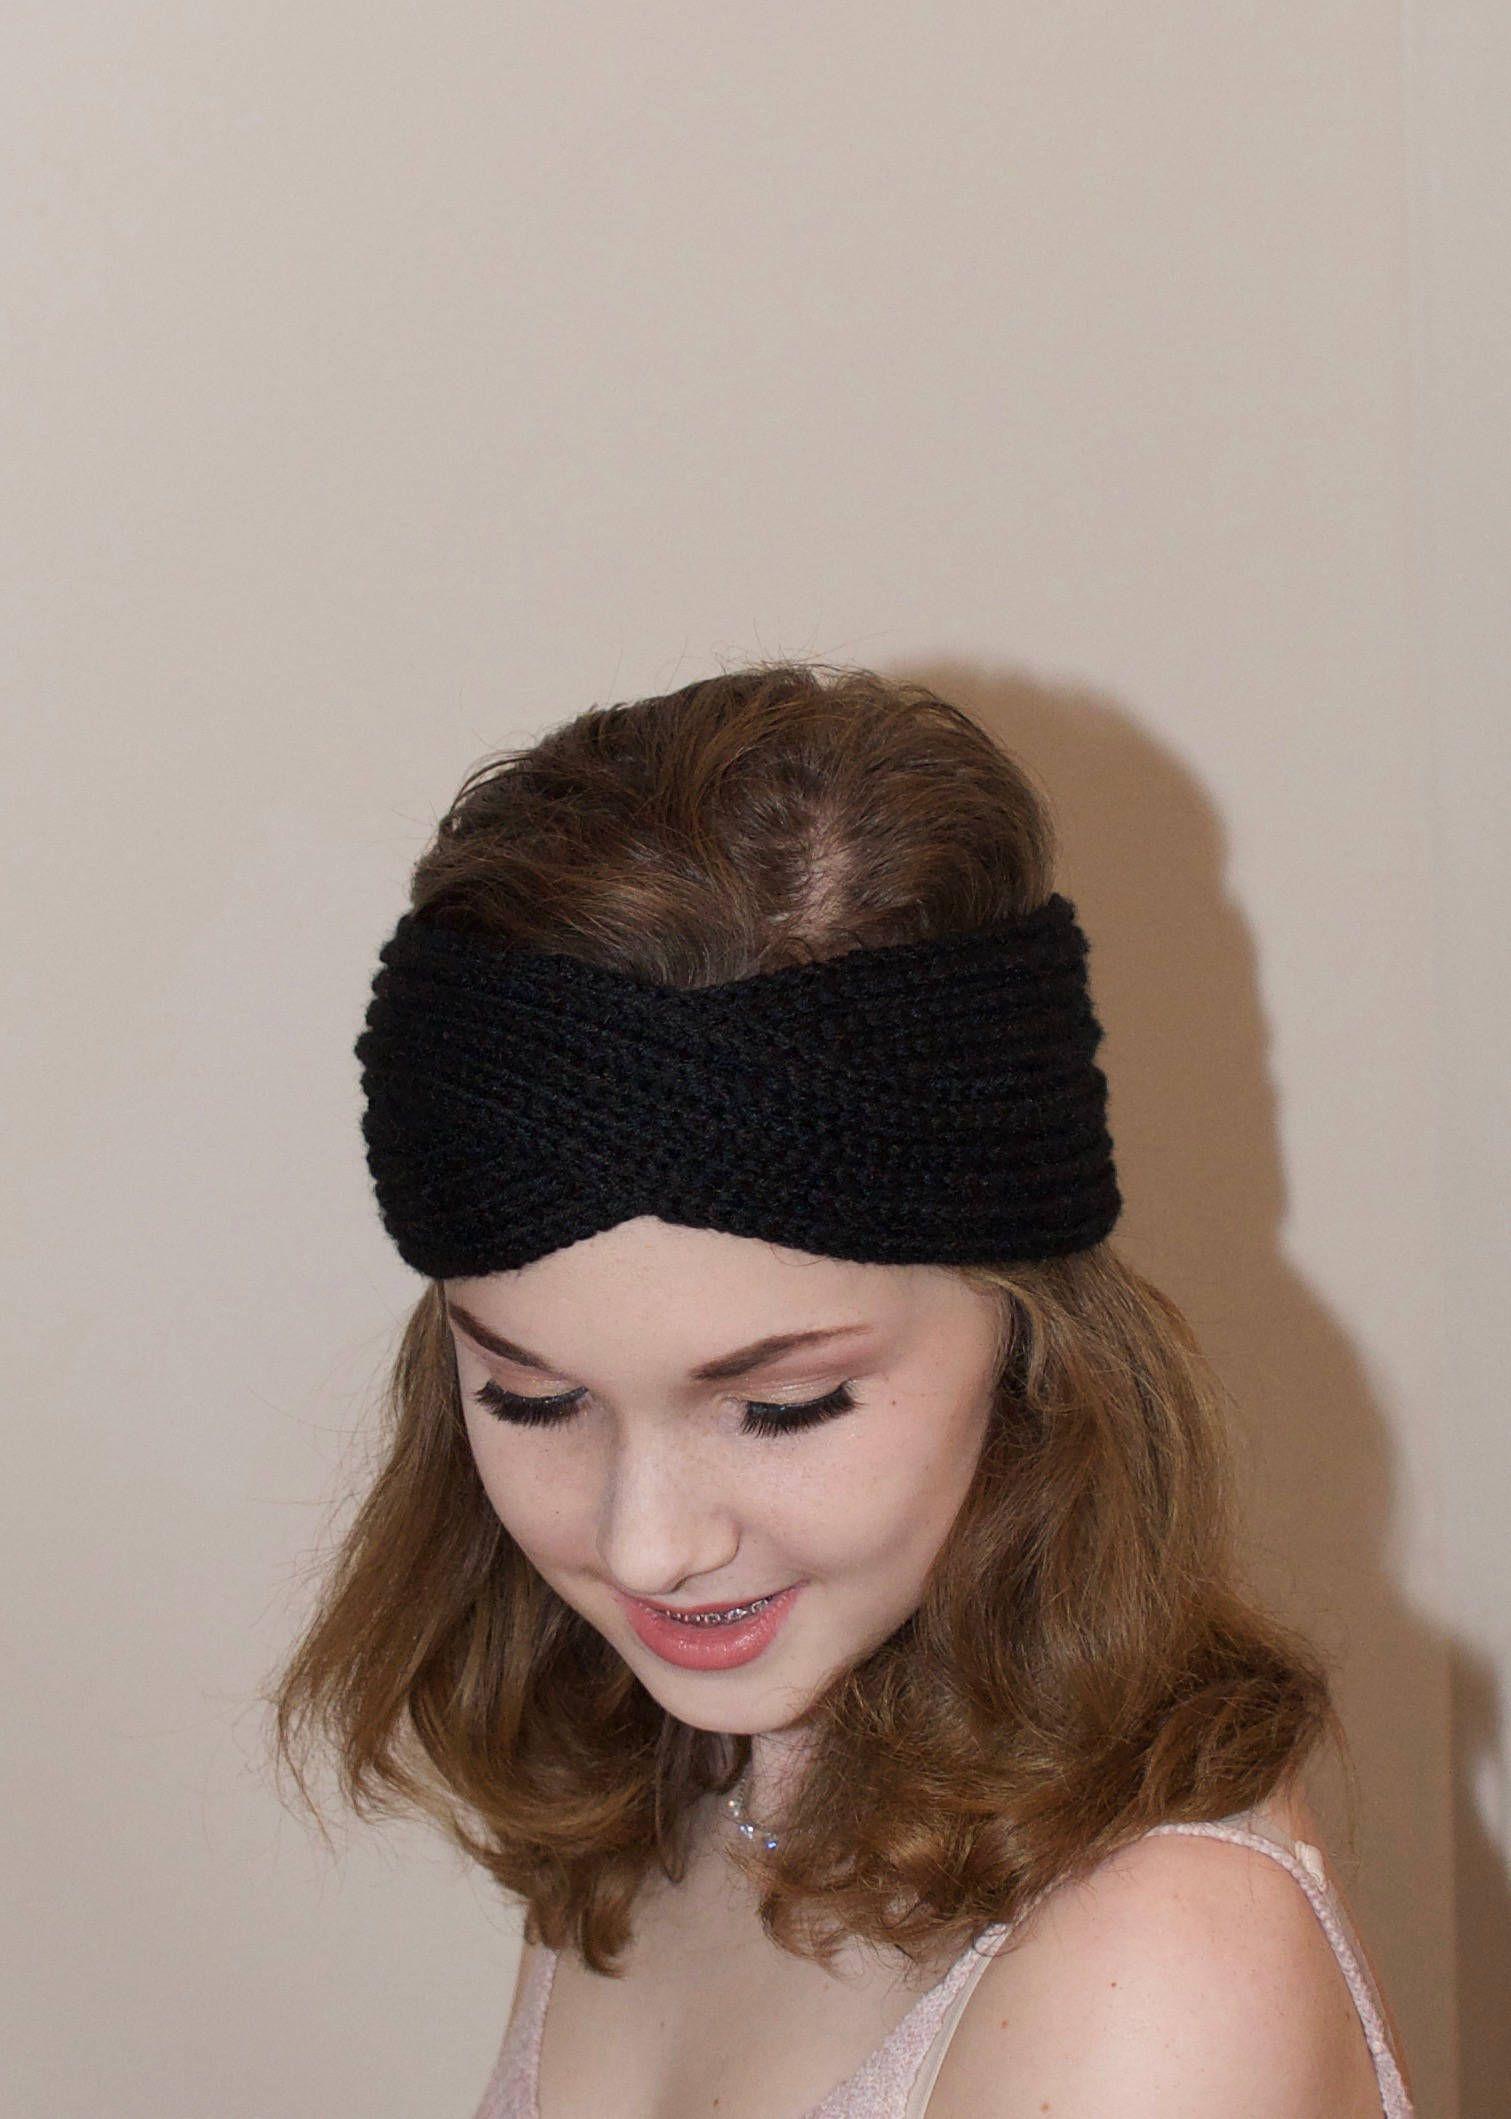 dd812f5d3a6 Black Turban Criss Cross Headband Black ear warmer Teen Girl Winter  Headband Black Teen Girl Headband Christmas Gift under 20 by lucymir on Etsy